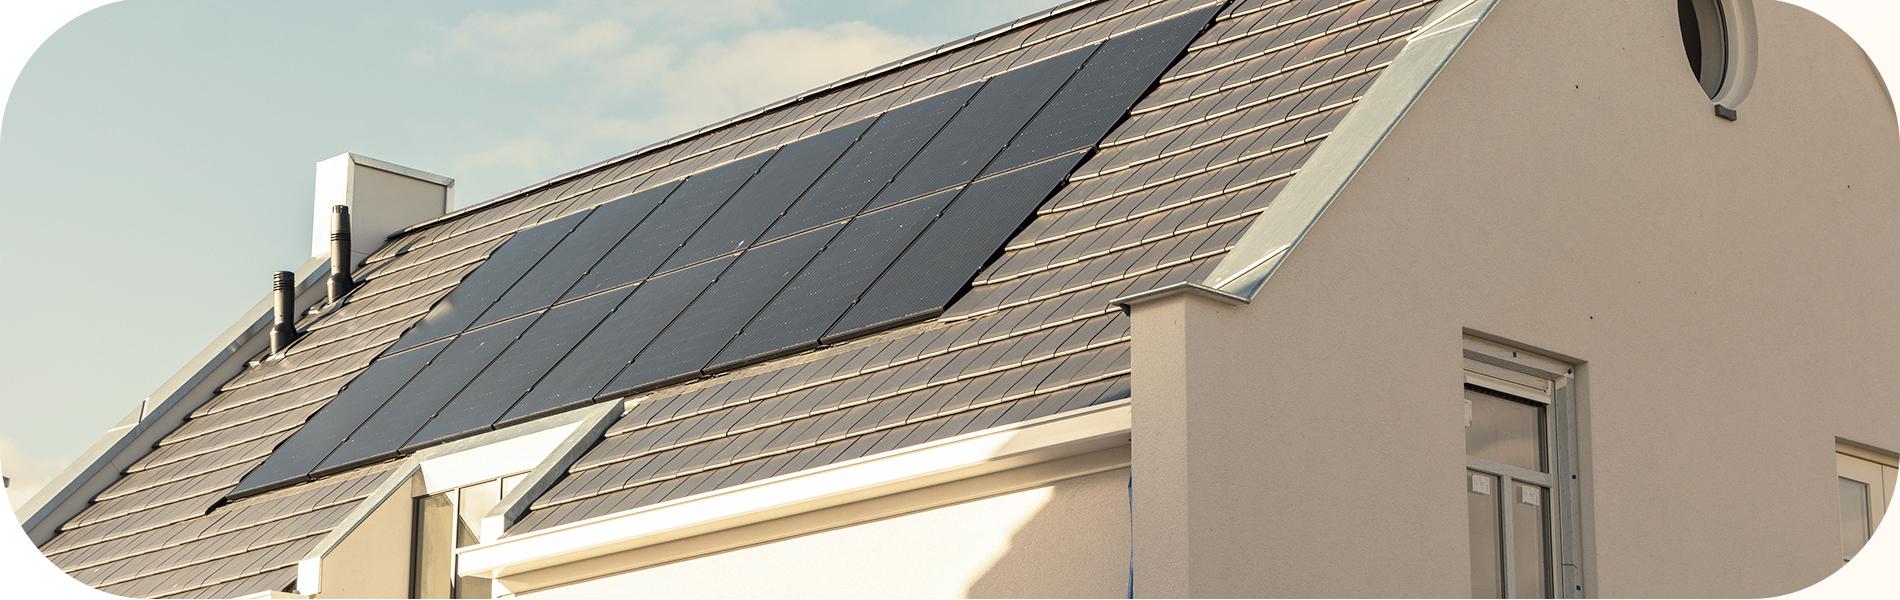 zonnepanelen-energieneutraal-wonen